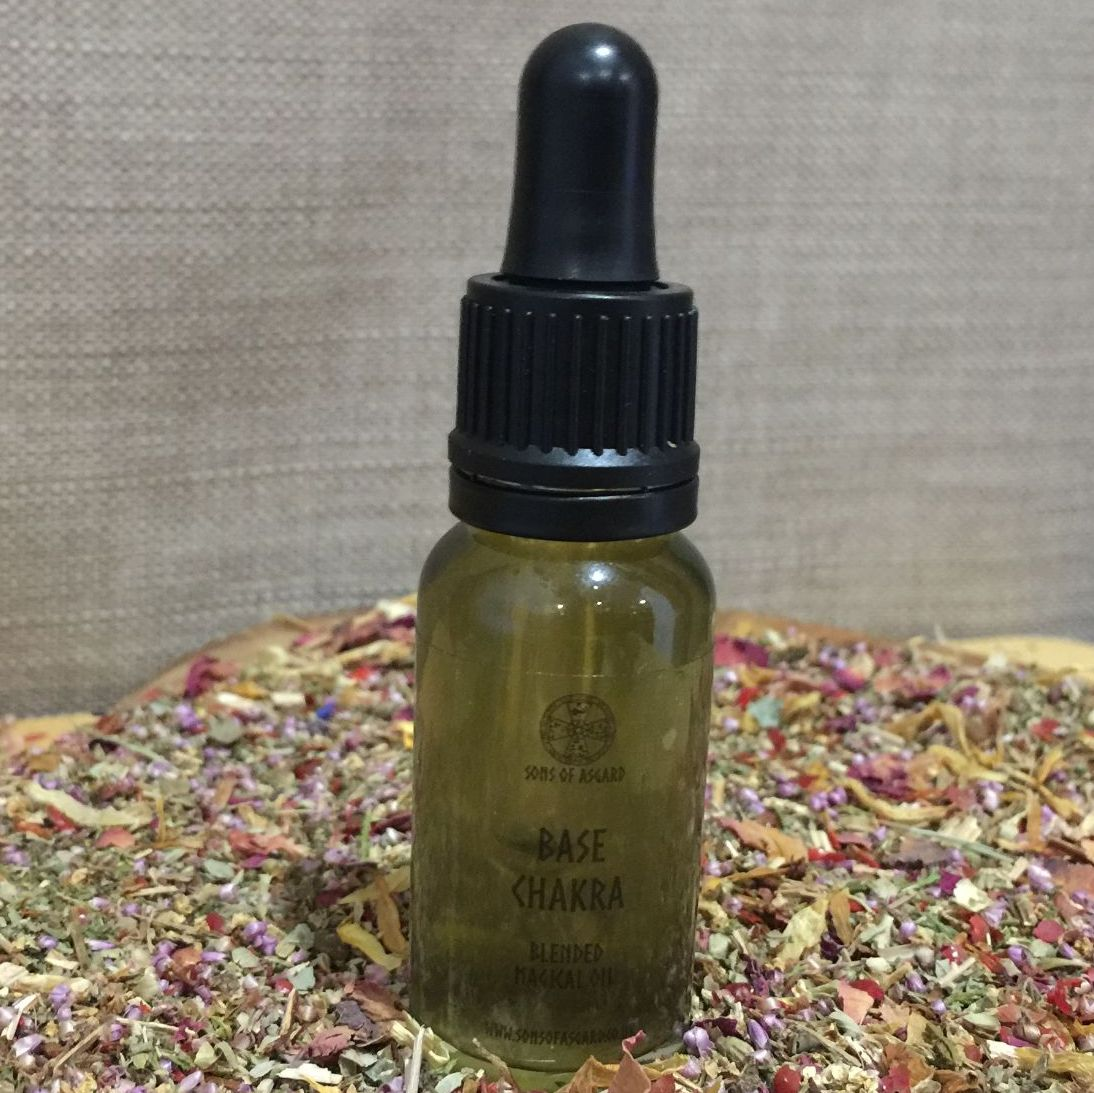 Base Chakra - Magical Oil